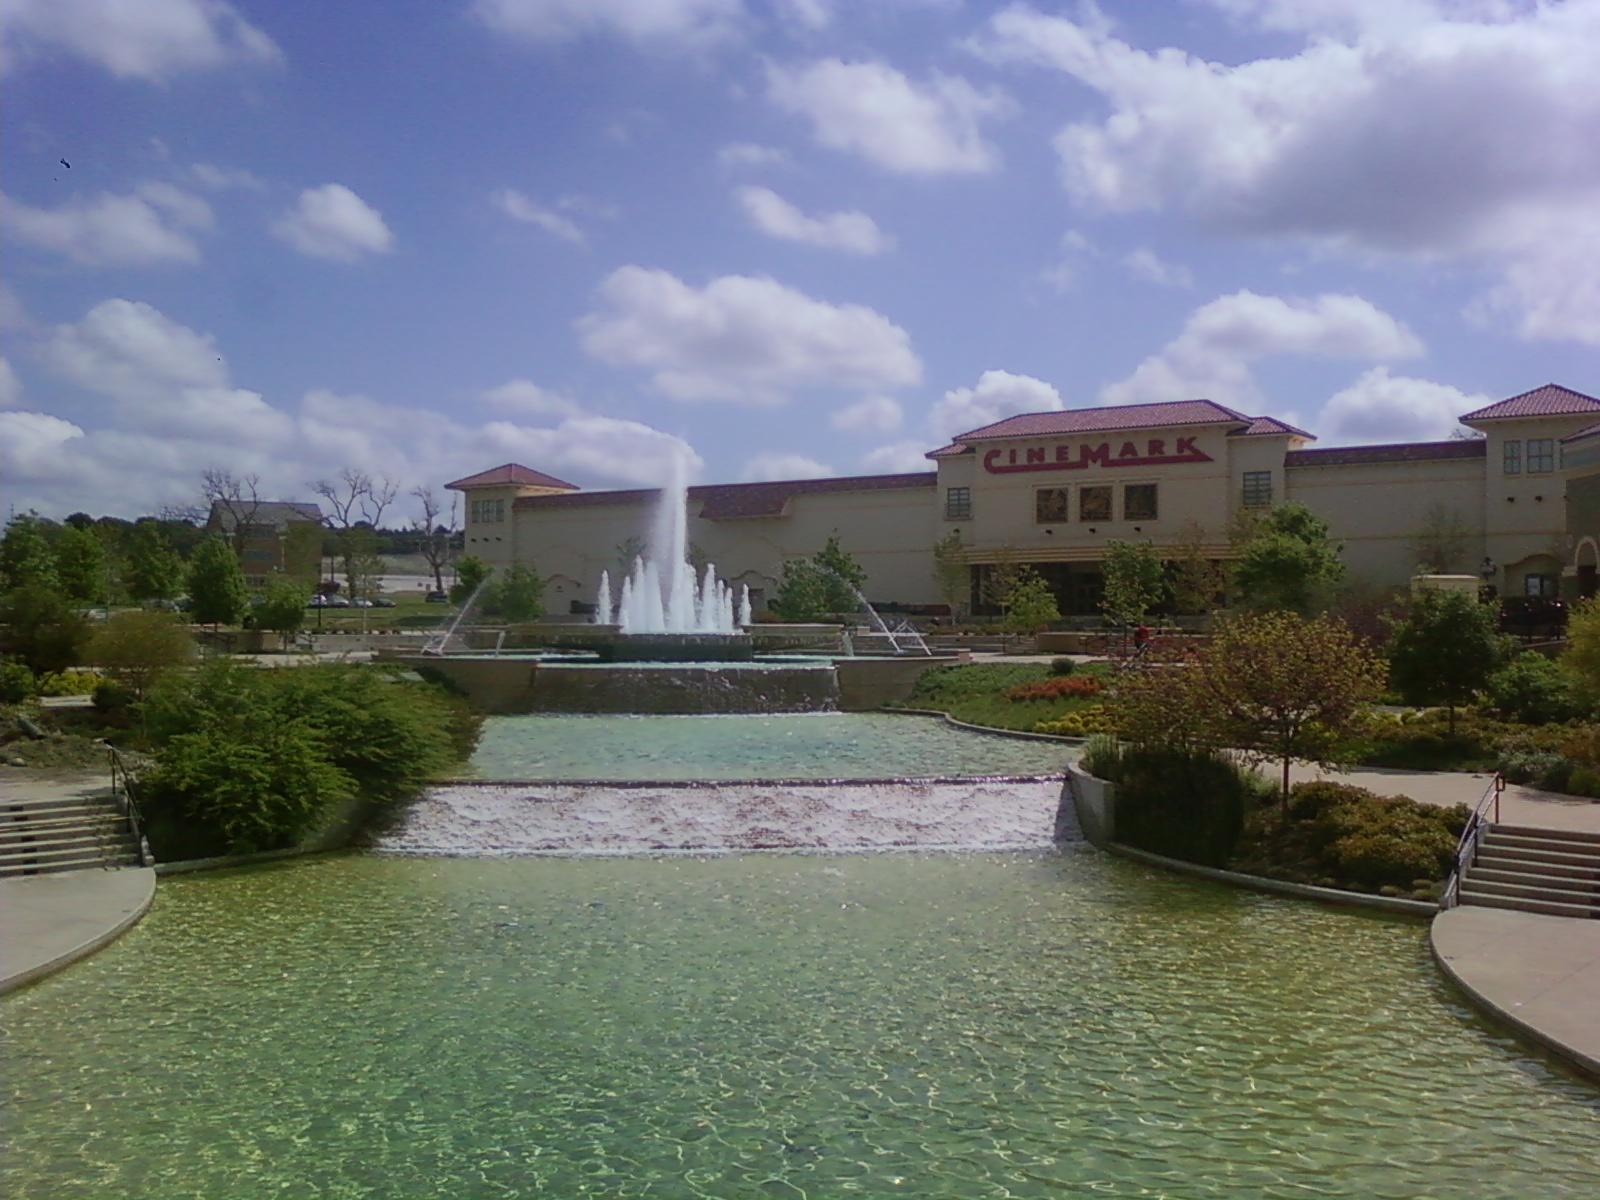 Rockwall TX Real Estate: Dallas Suburb Guide